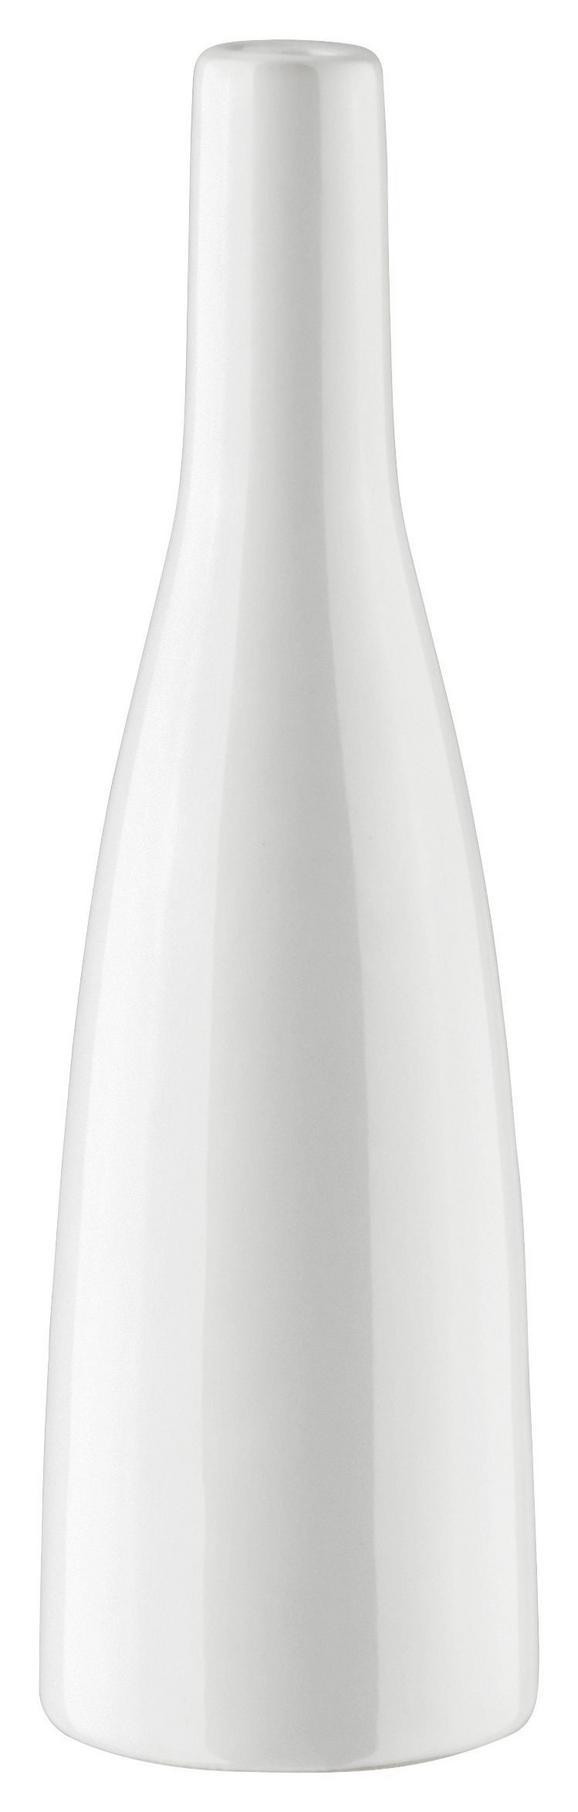 Váza Plancio - fehér, modern, kerámia (20.5cm) - MÖMAX modern living